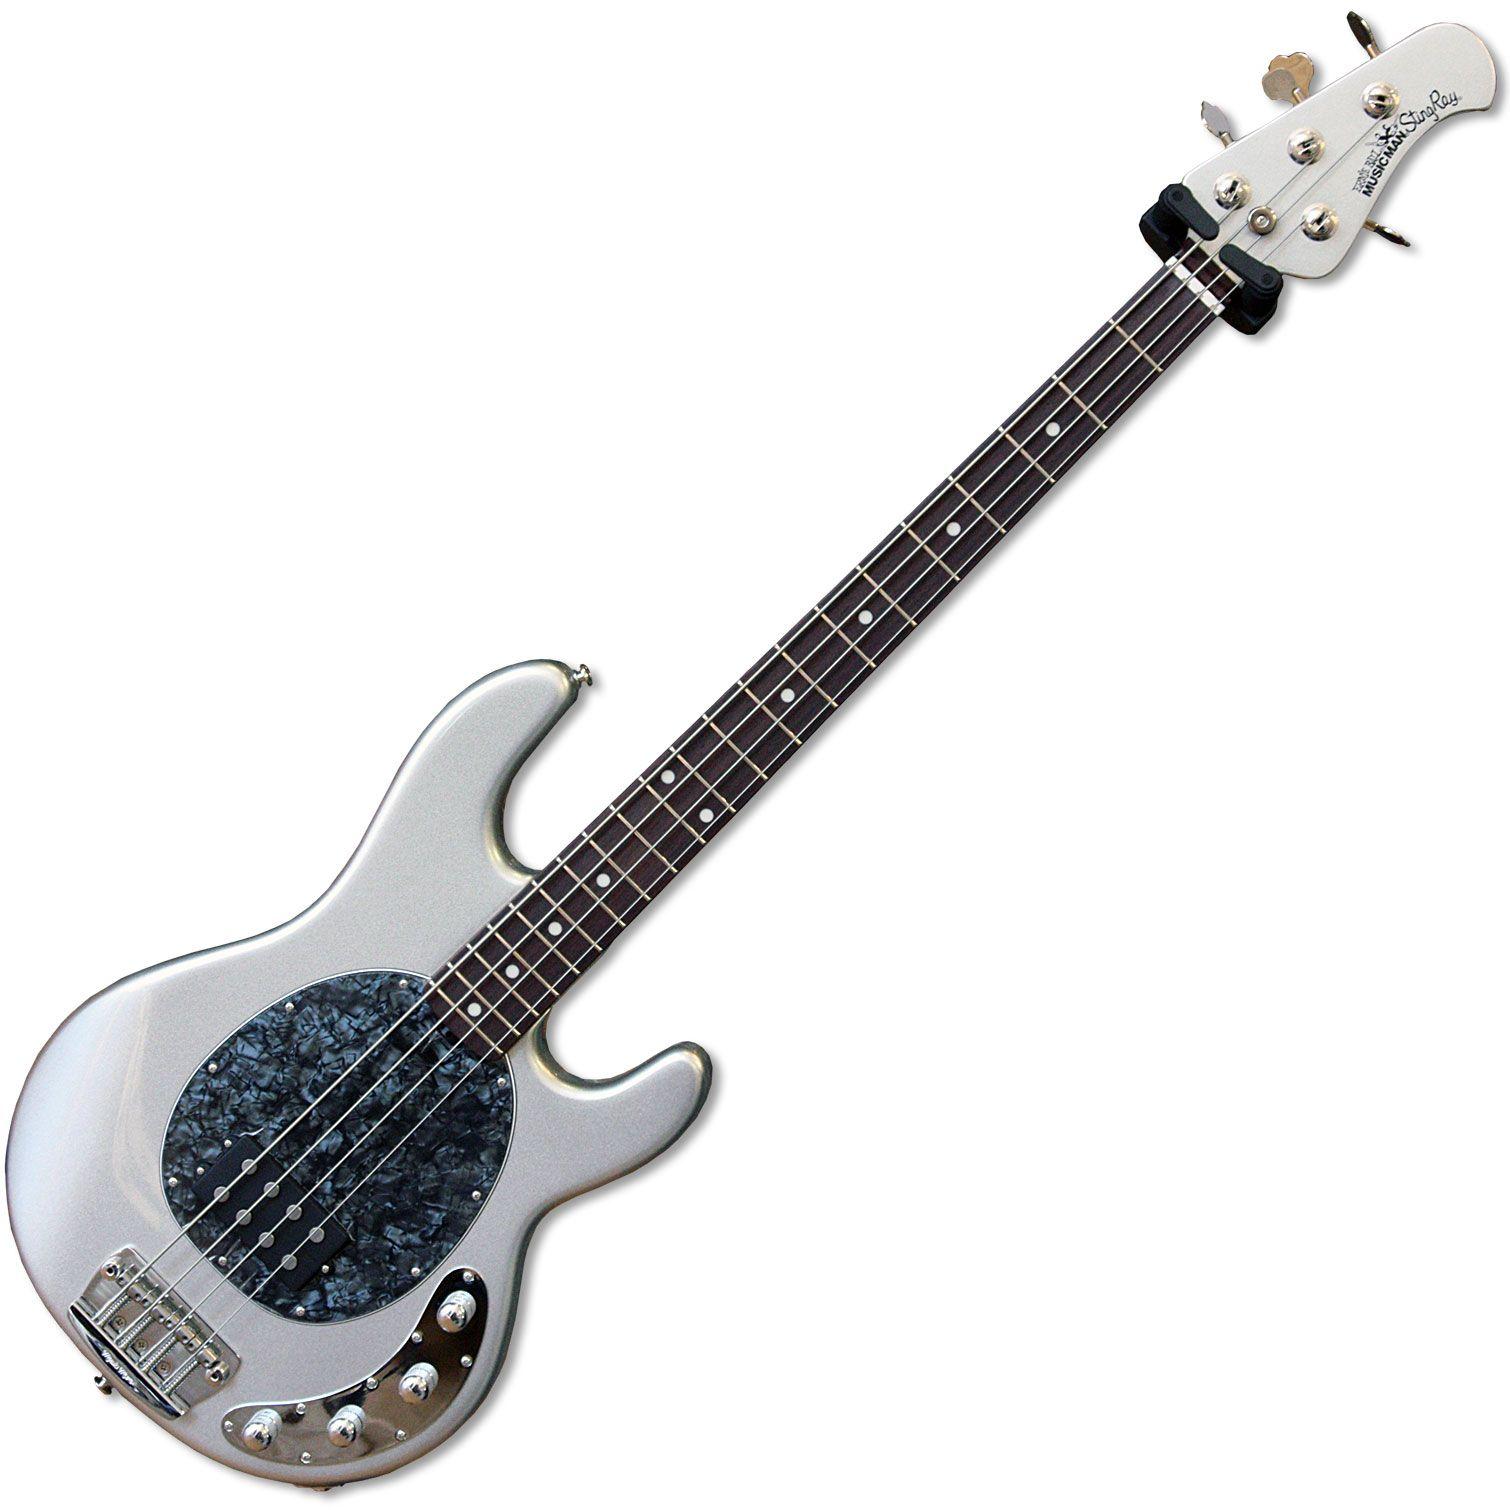 Musicman Stingray 3eq Bass Guitar Sterling Silver At Music Village Education Bass Guitar Guitar Bass